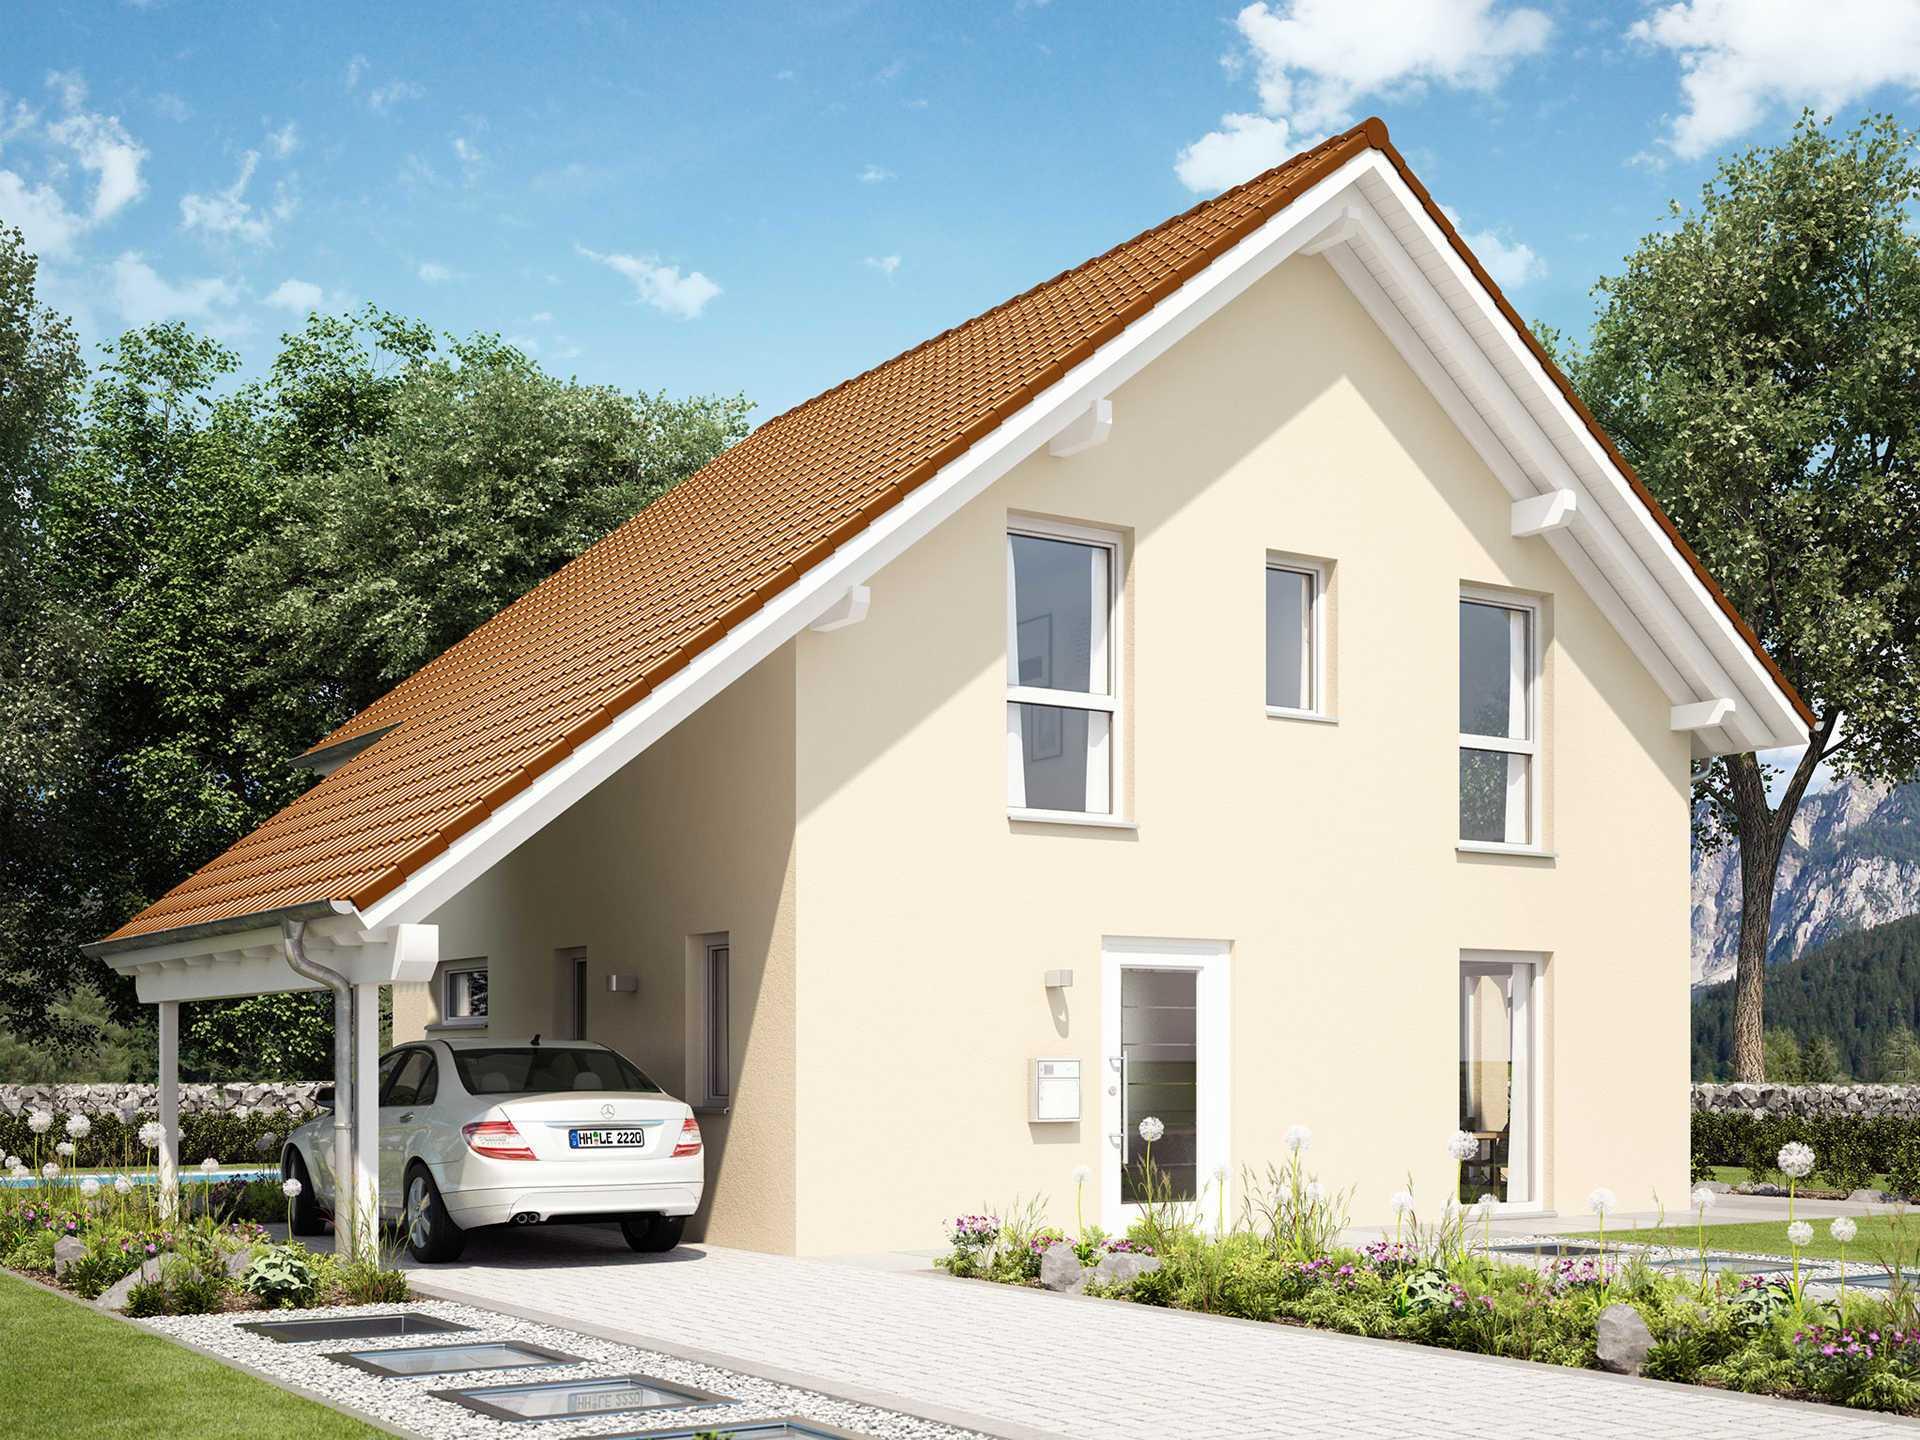 Einfamilienhaus evolution 116 v8 bien zenker for Modernes haus mit carport